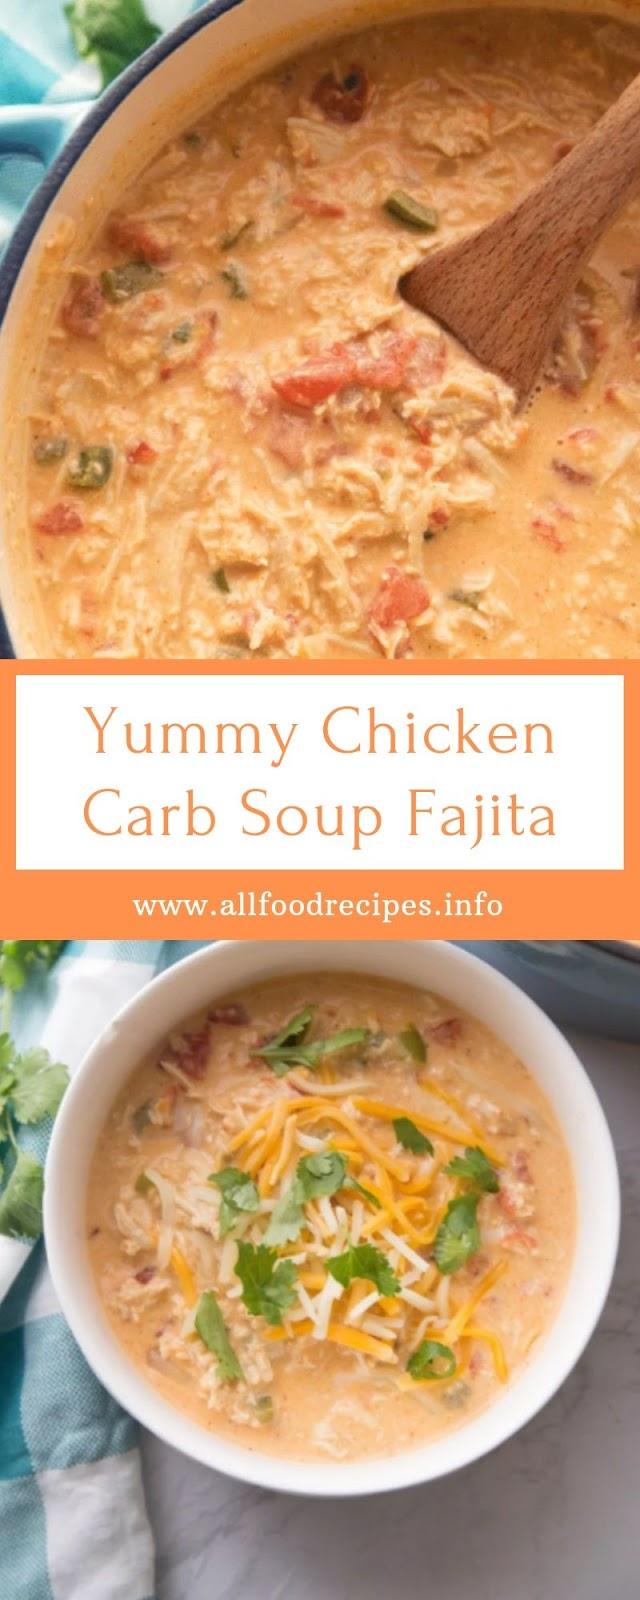 Yummy Chicken Carb Soup Fajita